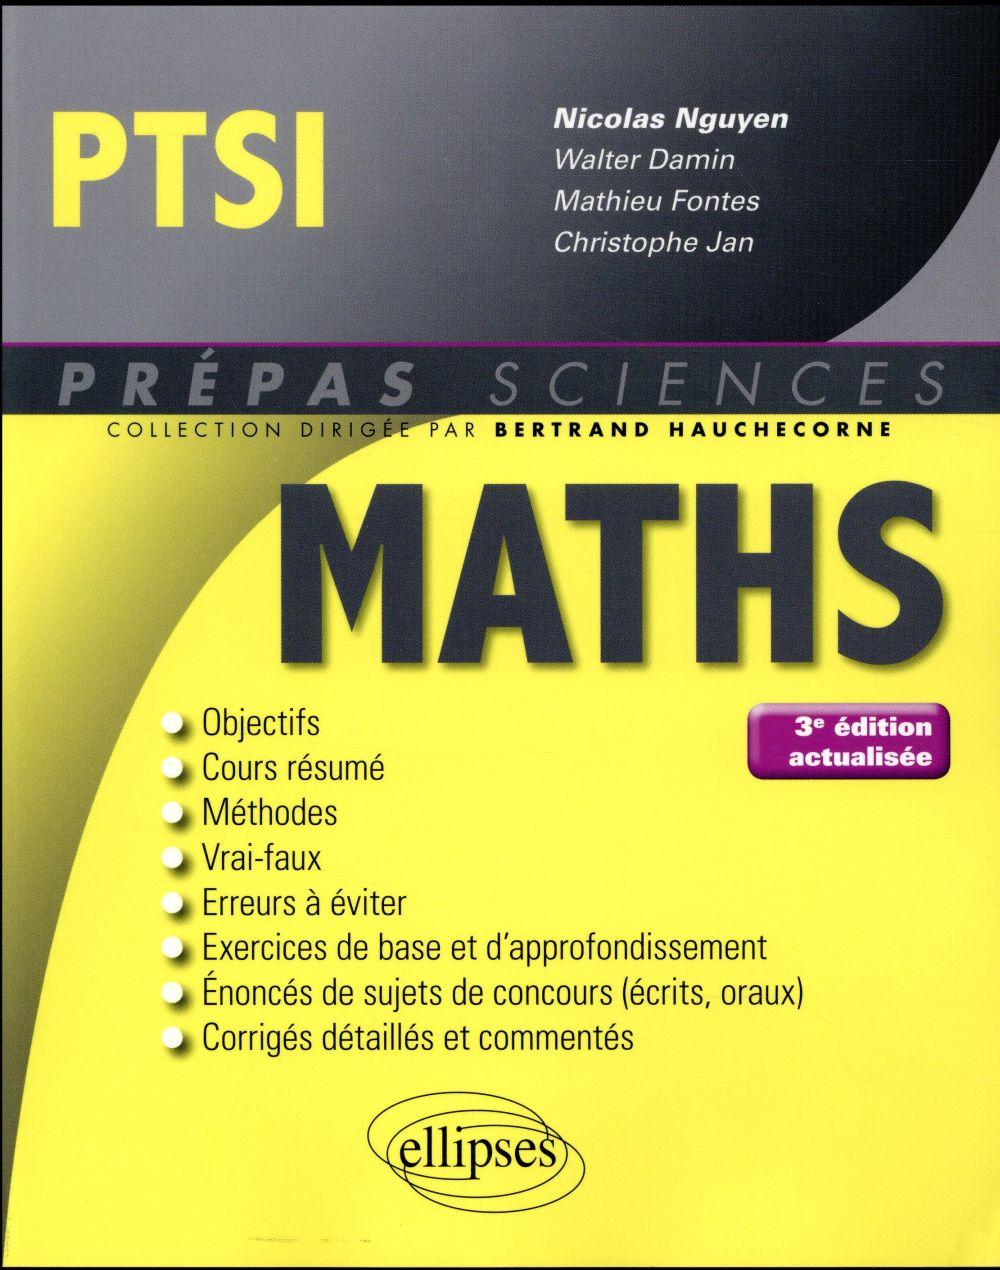 Jan Christophe - MATHEMATIQUES PTSI - 3E EDITION ACTUALISEE